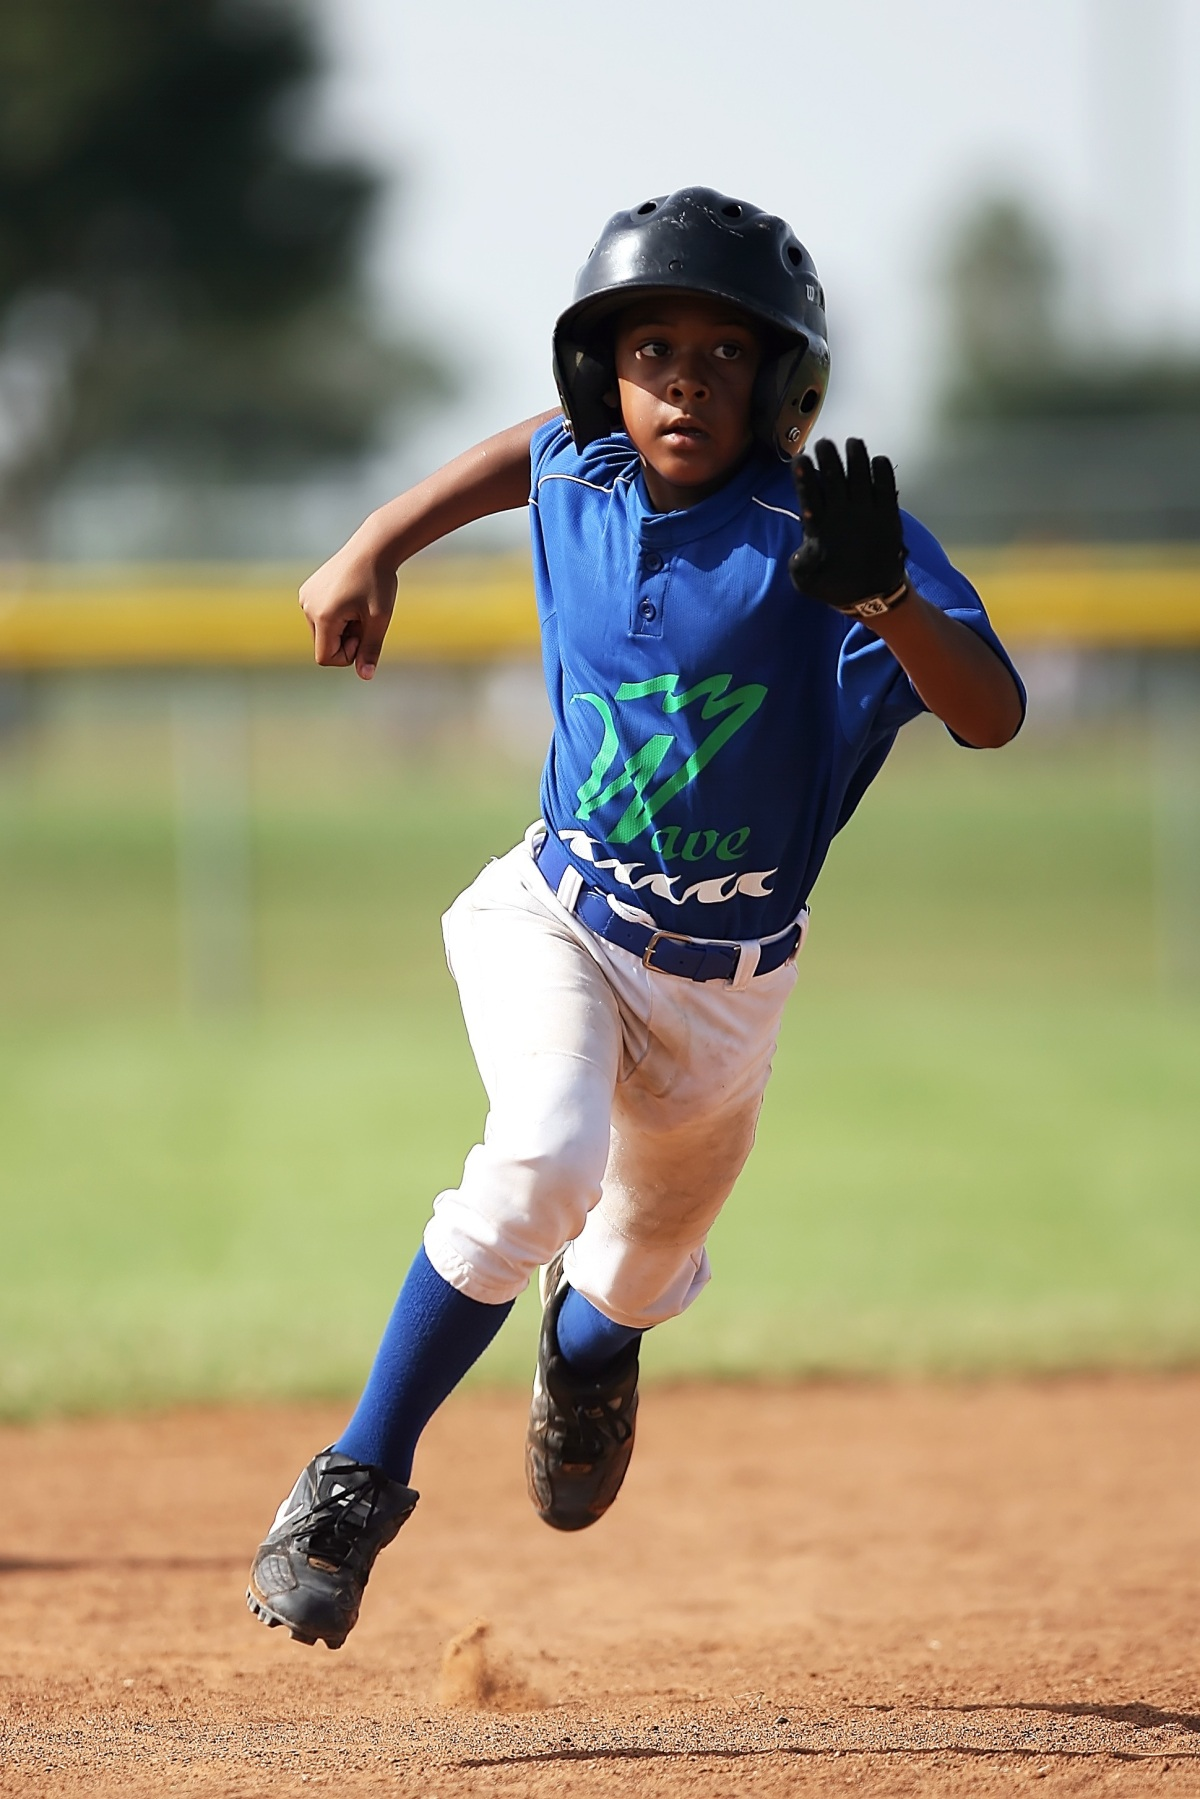 baseball-player-running-sport-163209